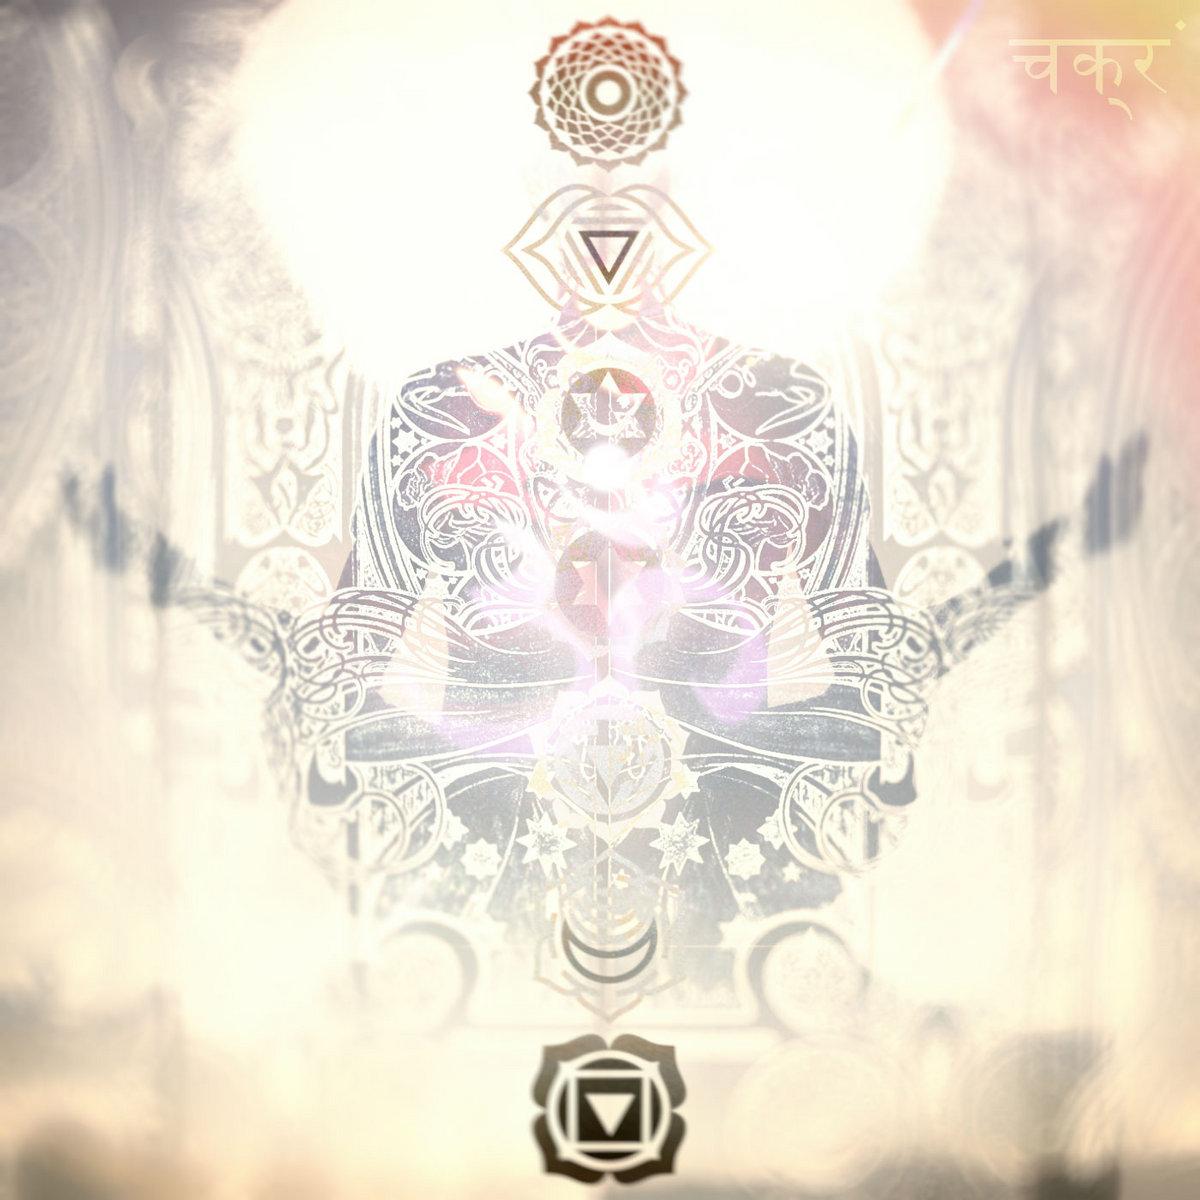 Venus (Shukra Mix 221 23Hz) Third Eye Brow Chakra - Libra